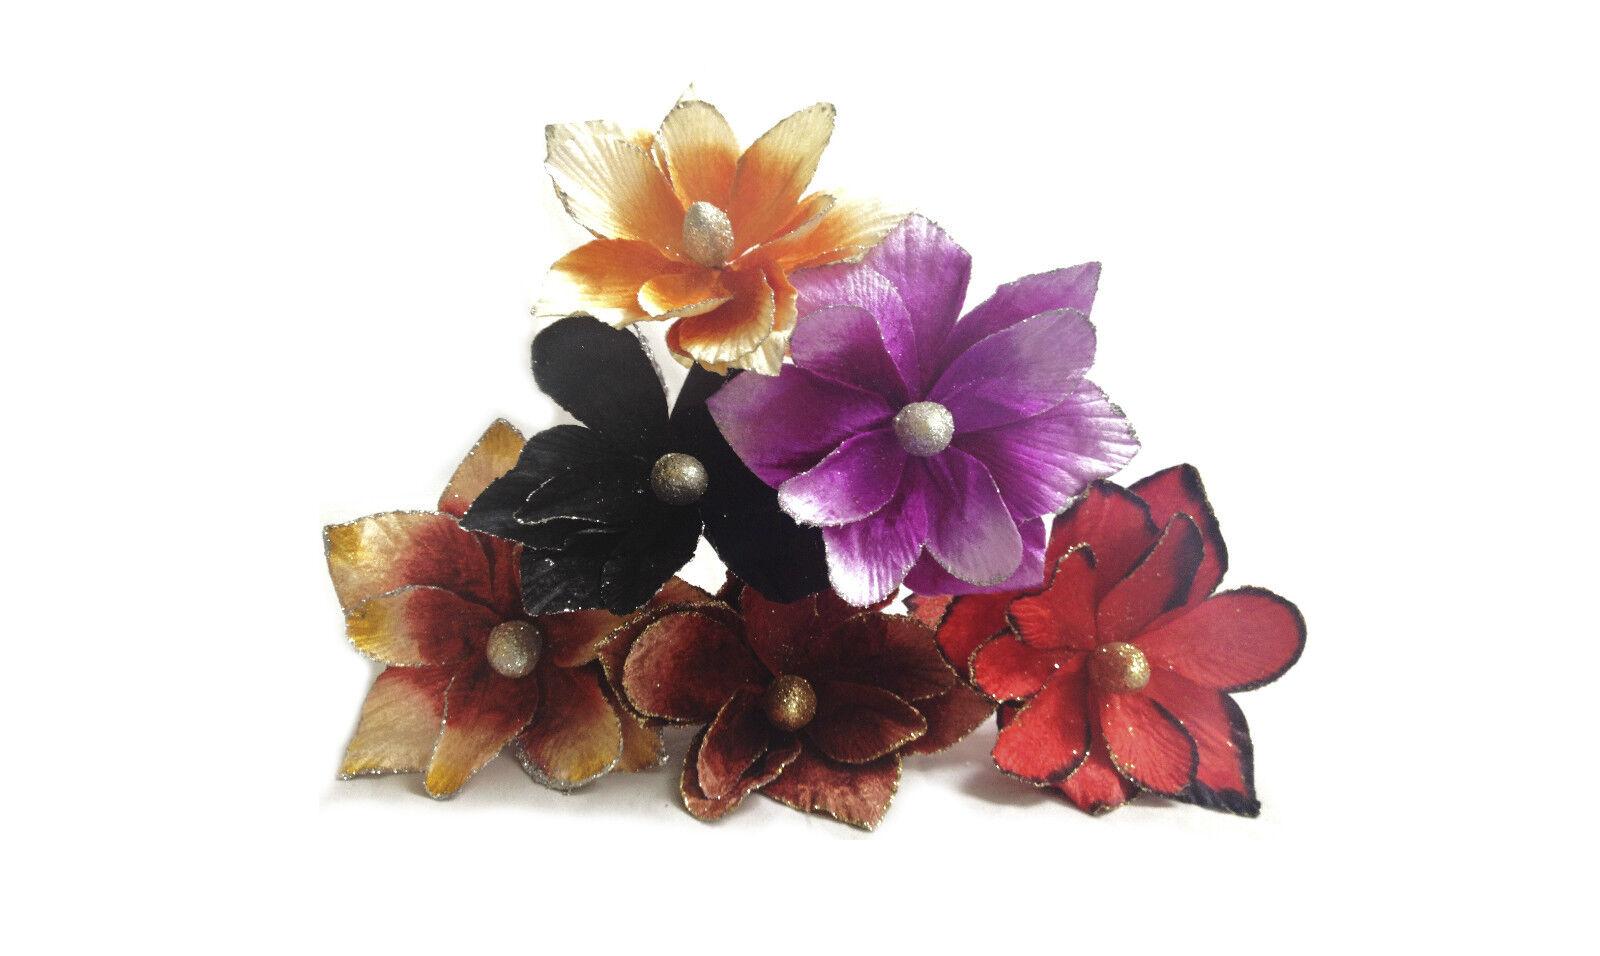 Job lot bulk buy wholesale velvet artificial flower single stem picture 1 of 5 izmirmasajfo